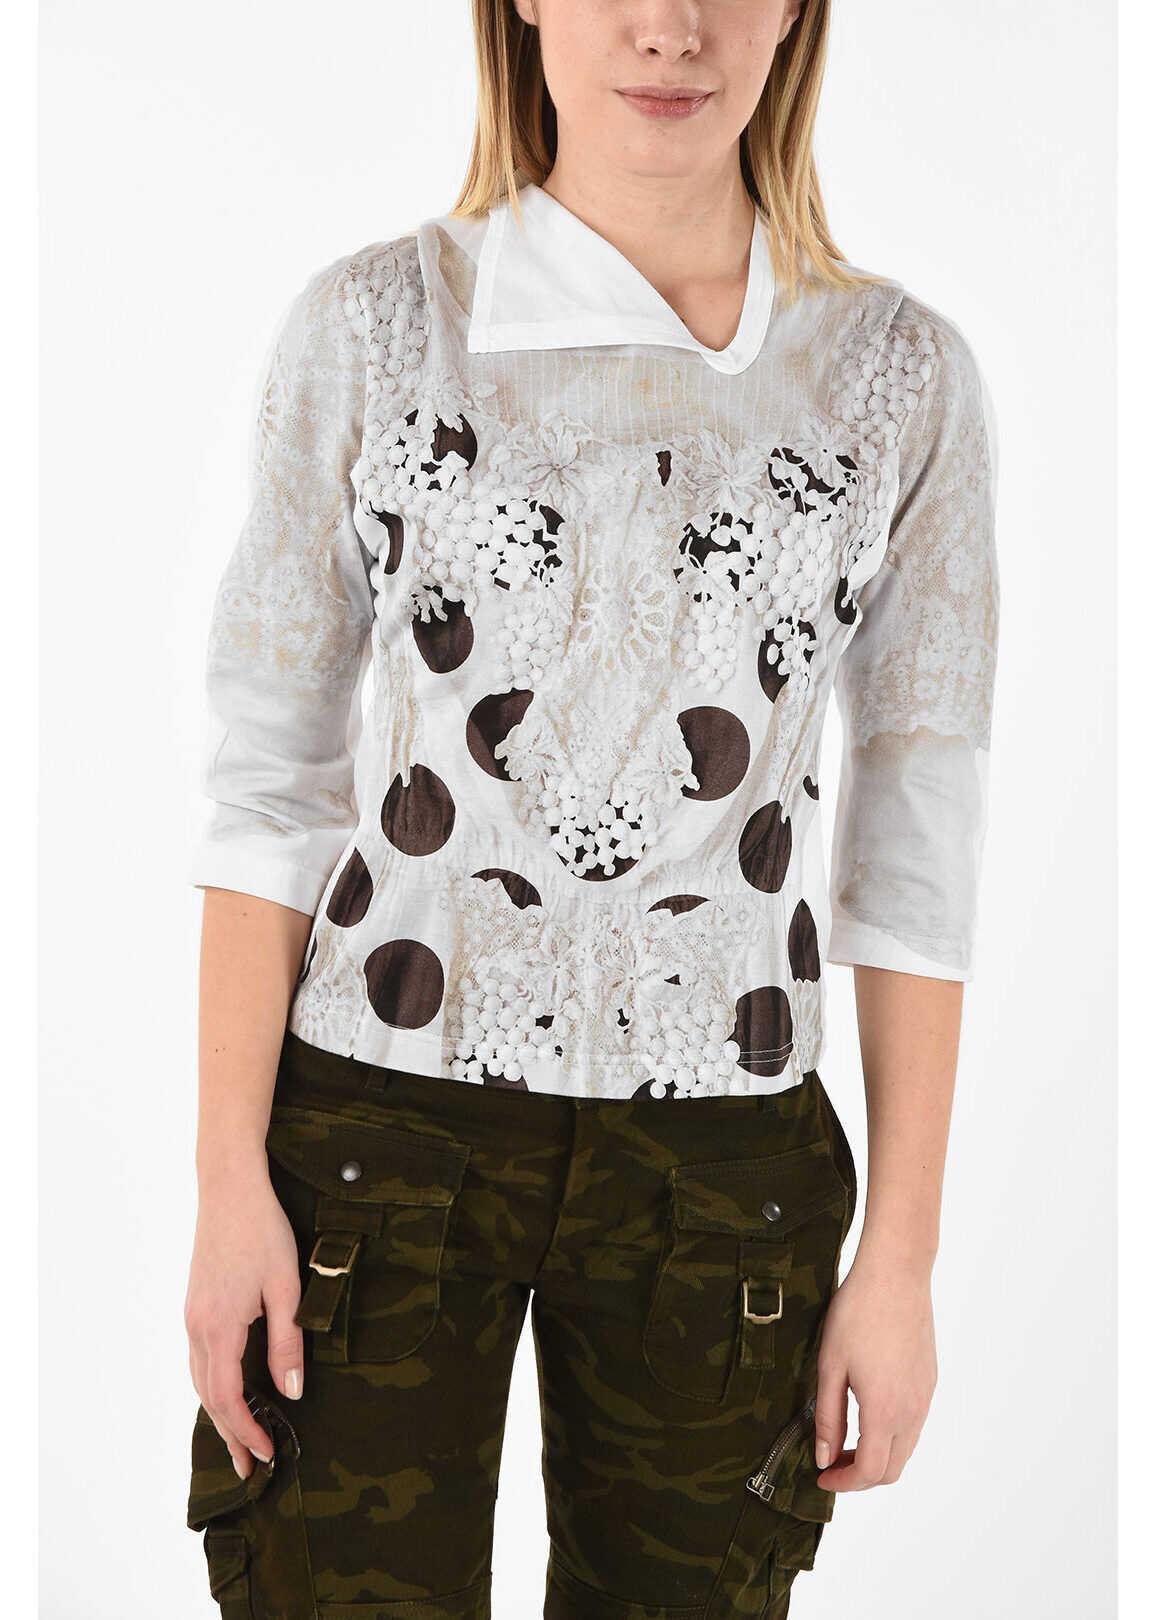 ¾ Sleeve Printed T-shirt Asymmetrical Collar